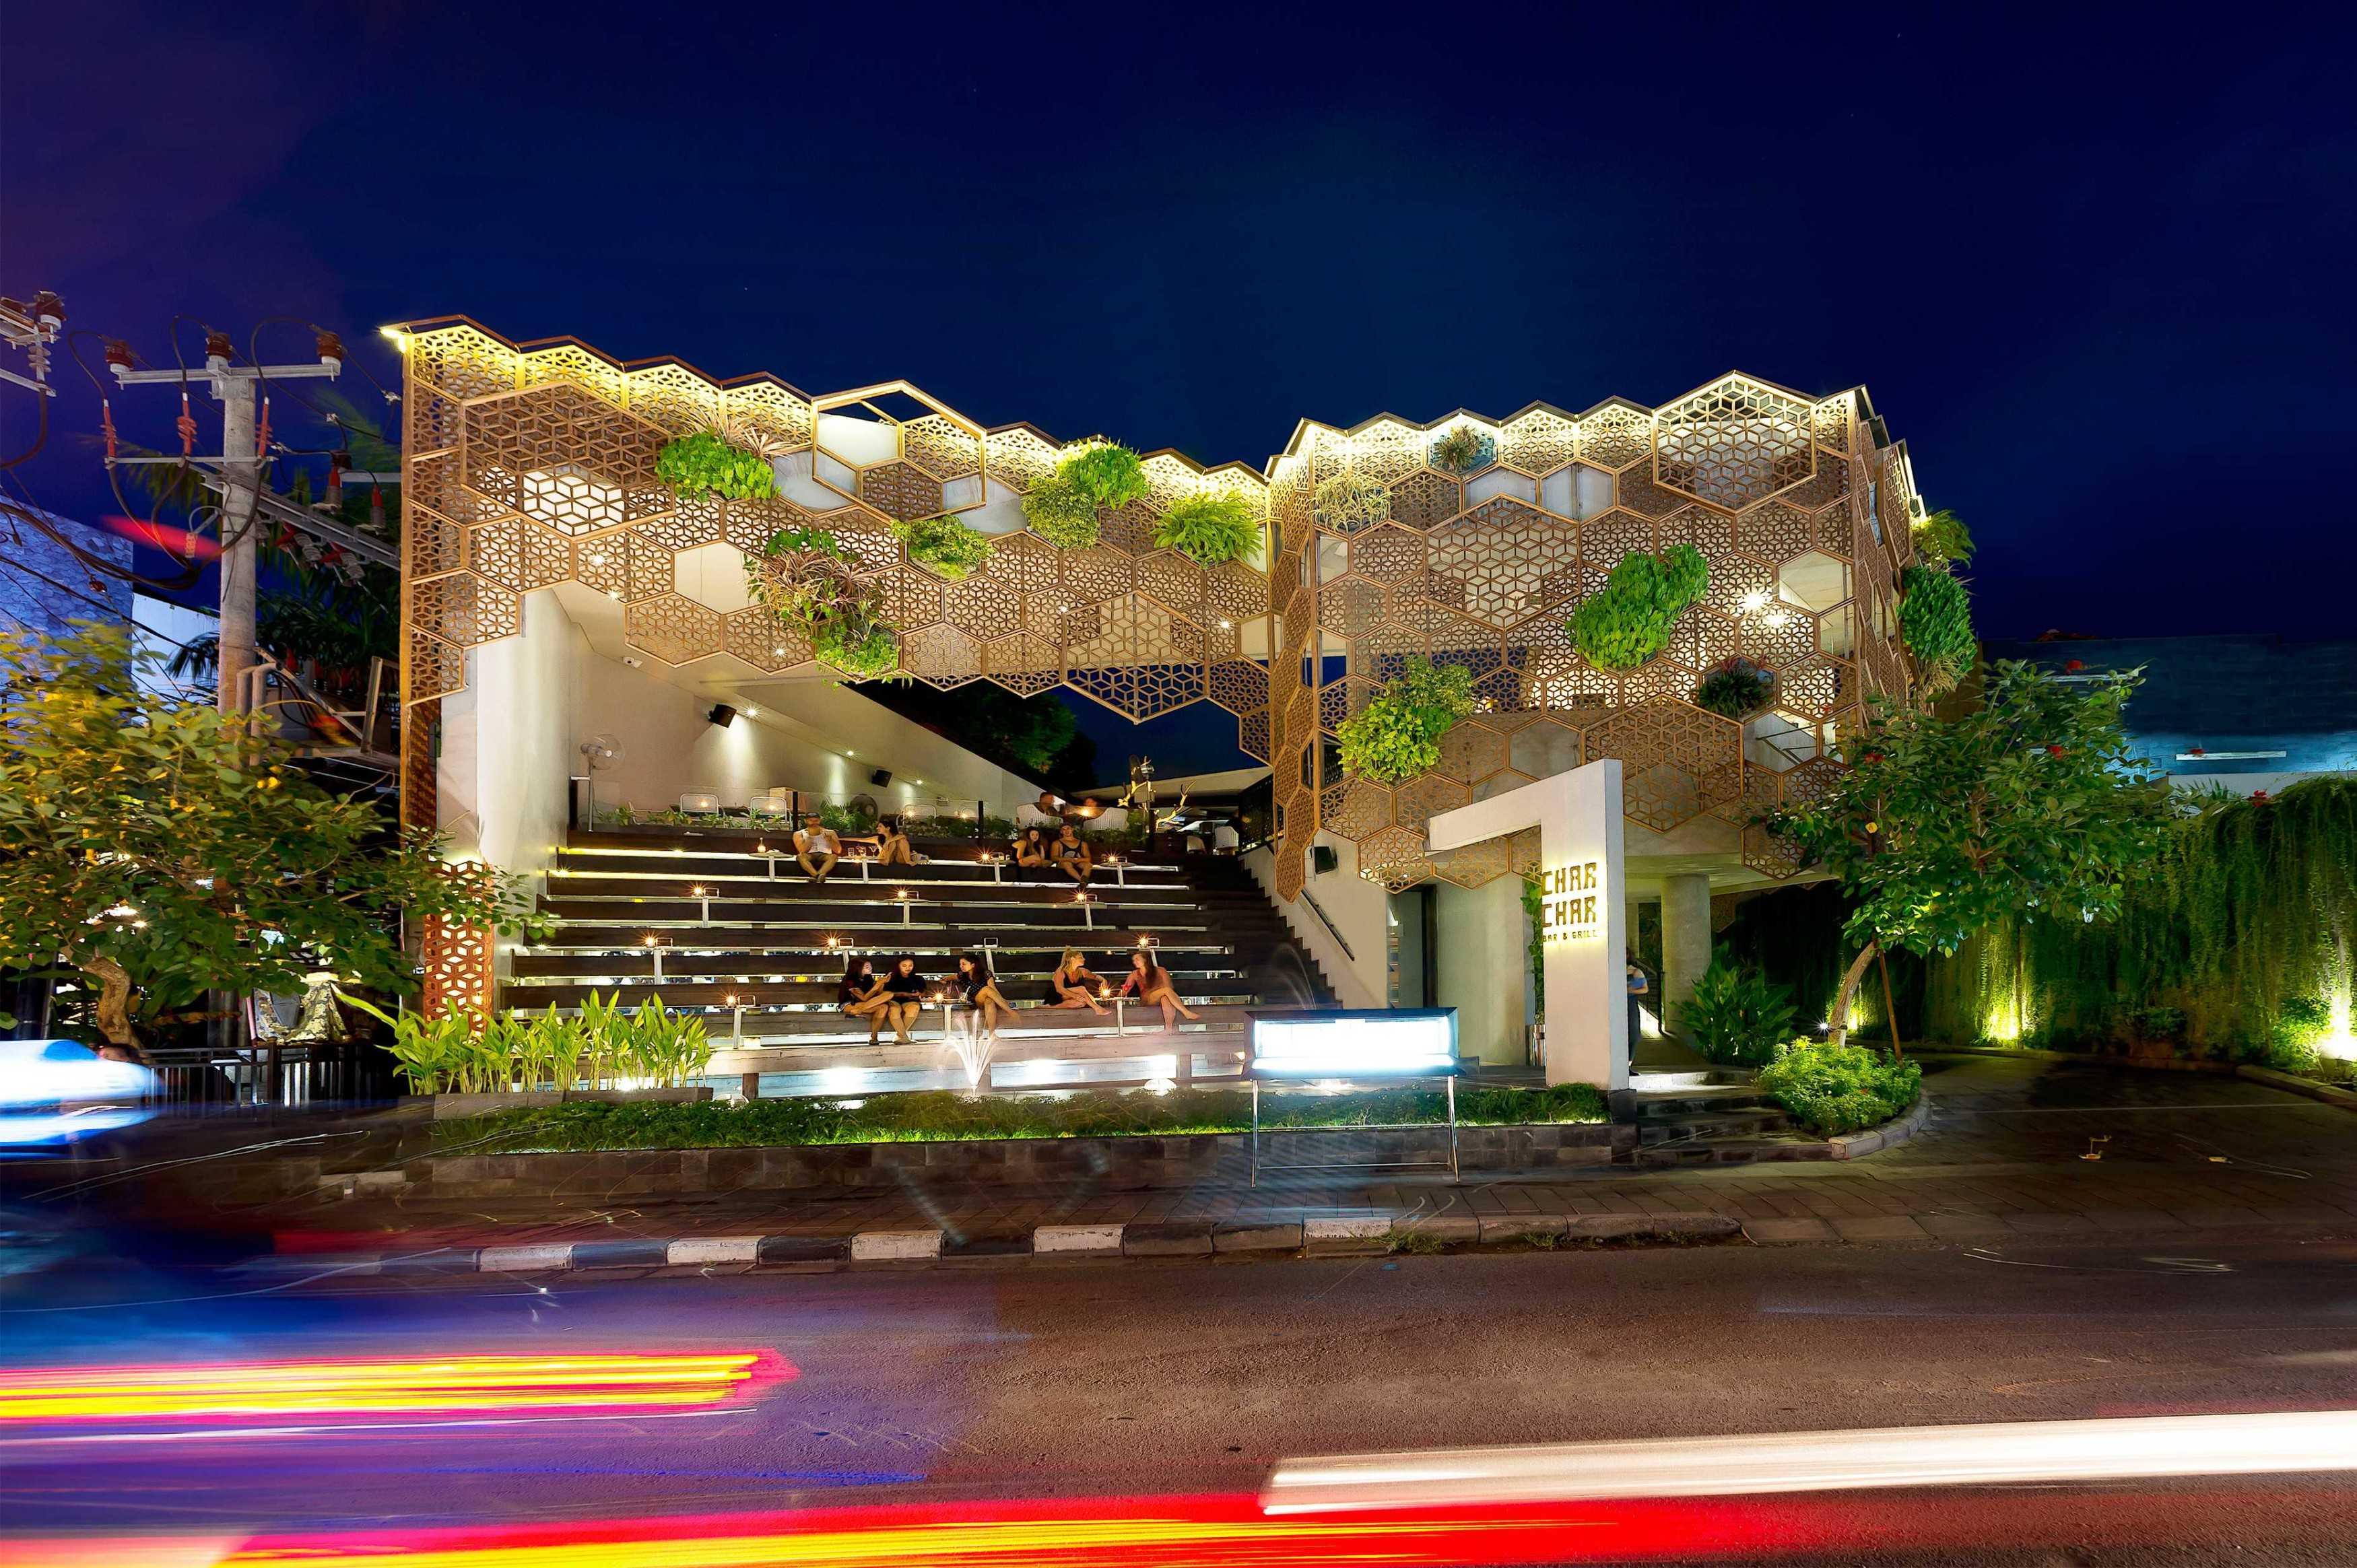 Mint-Ds Char Char Bar And Grill Jl. Kayu Aya, Seminyak, Bali Jl. Kayu Aya, Seminyak, Bali Front View   16159